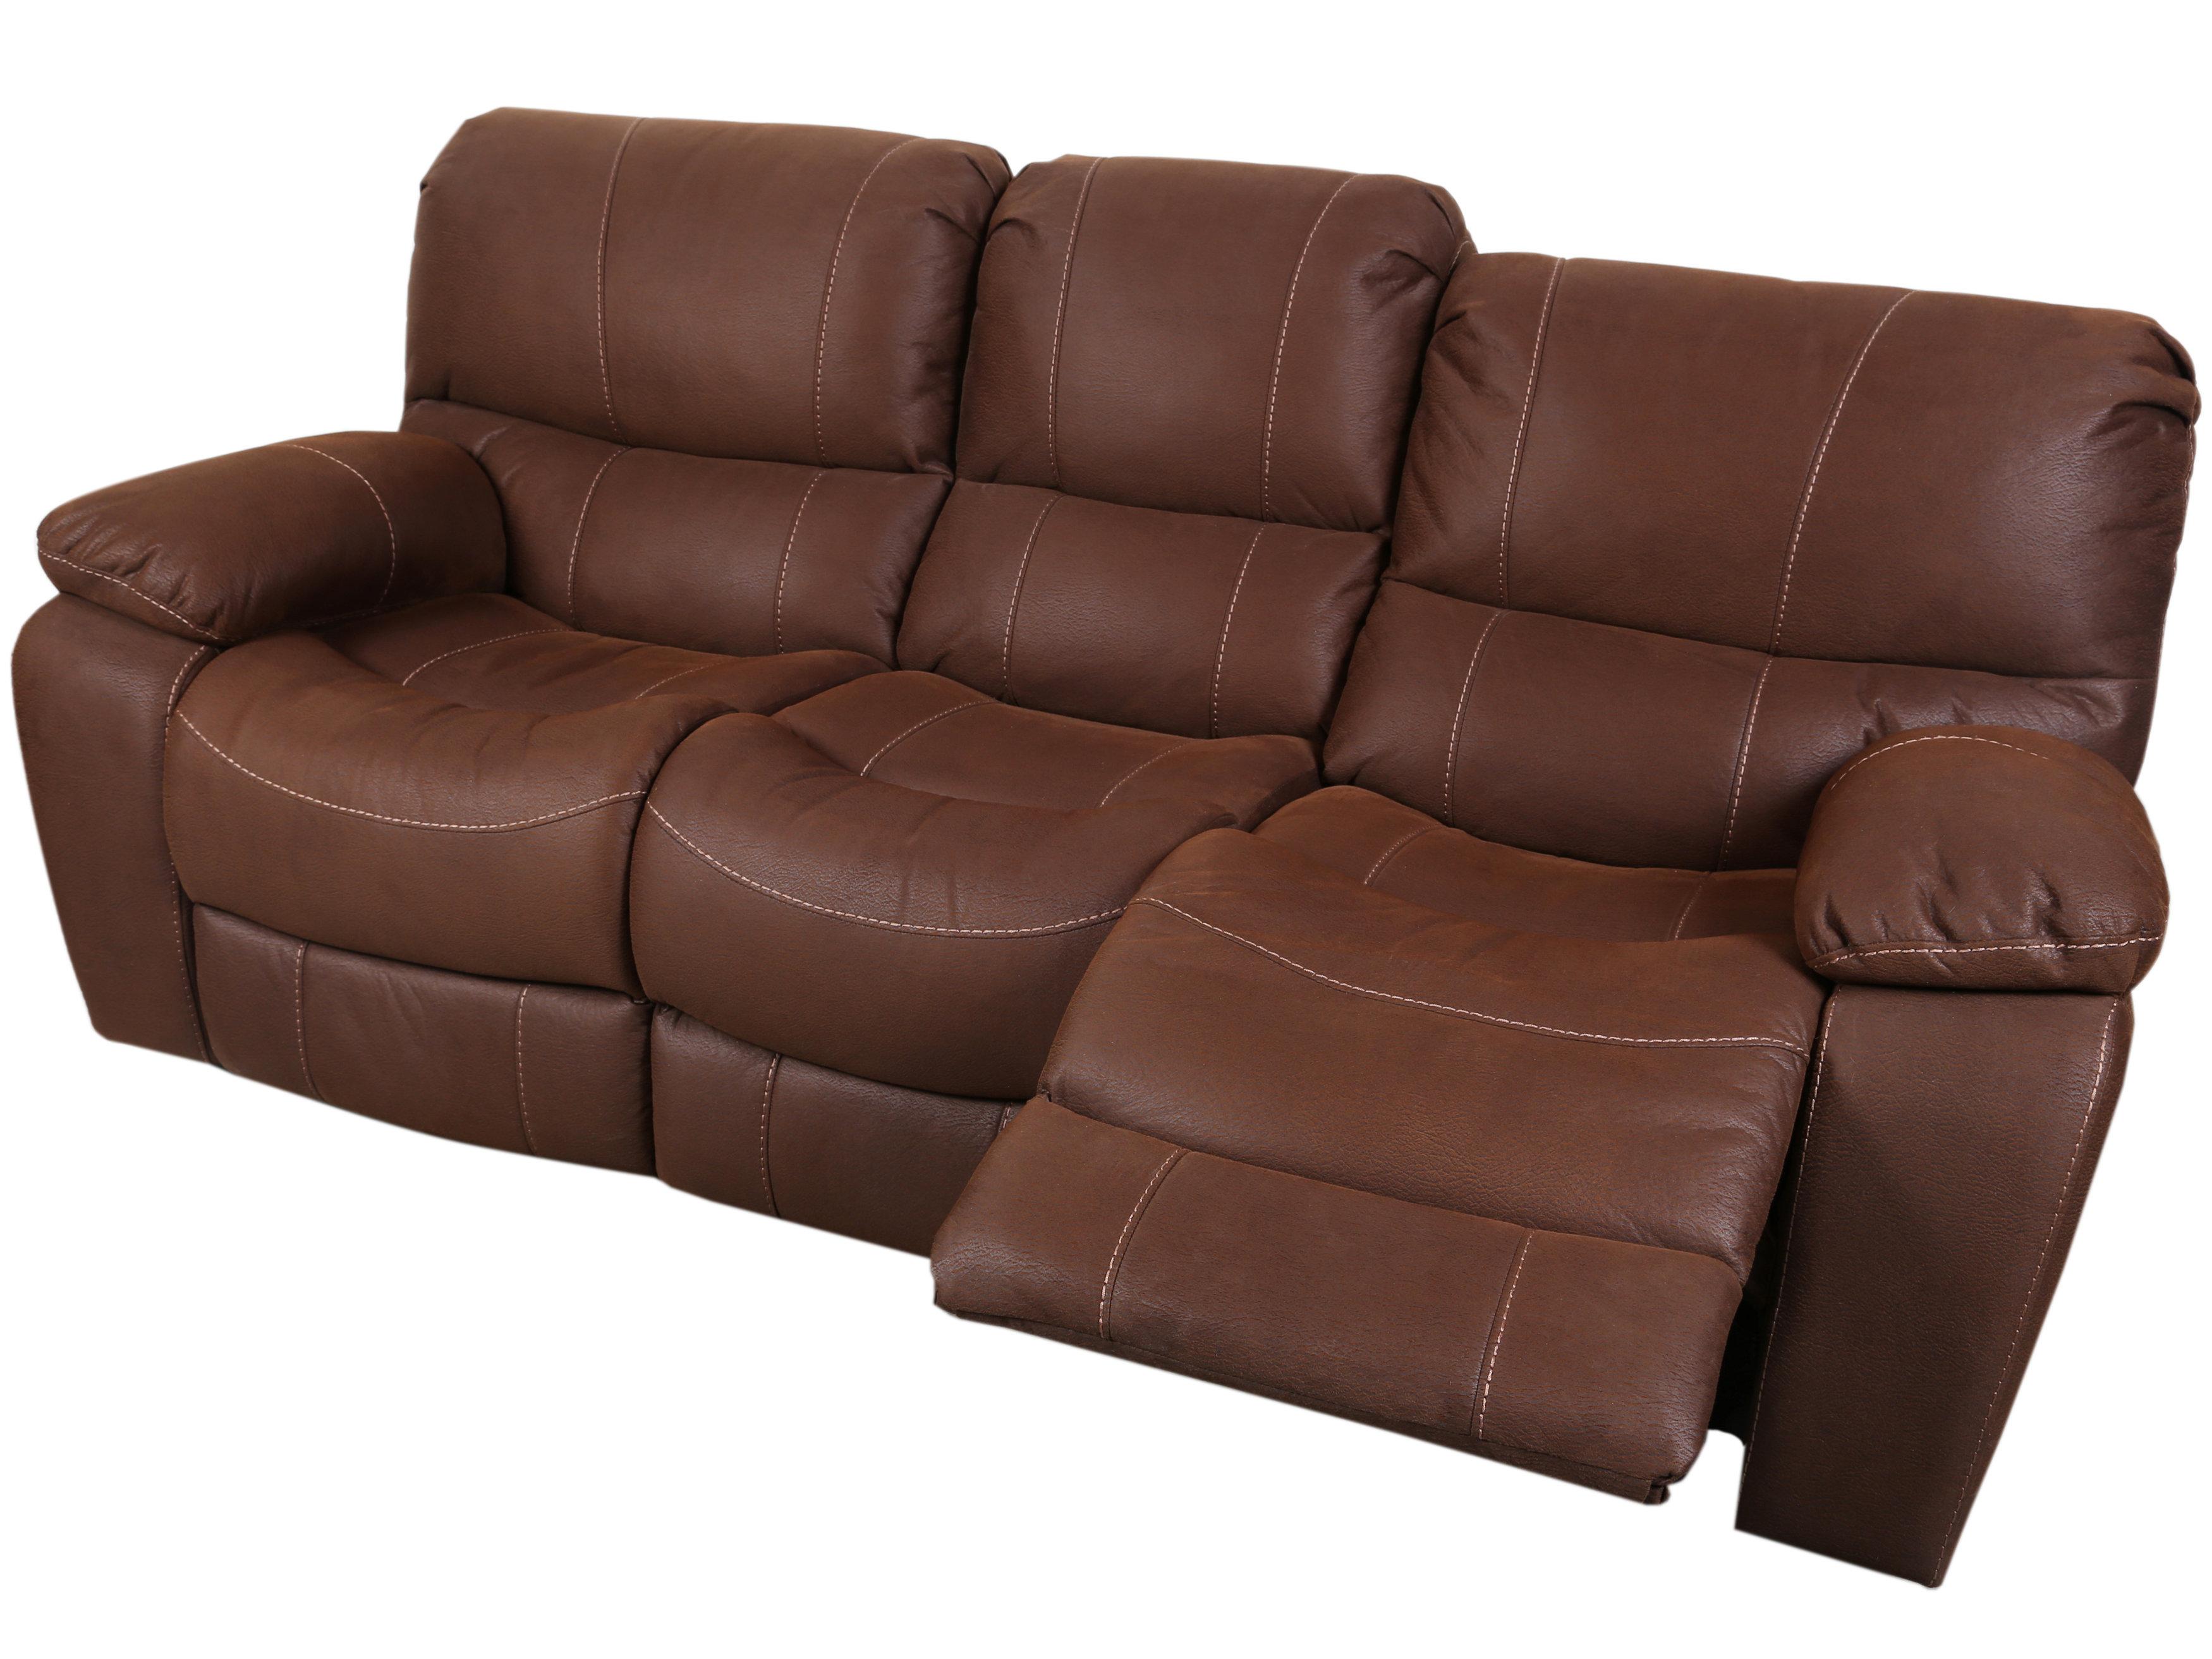 Red Barrel Studio Rashida Modern 3 Seats Reclining Sofa | Wayfair